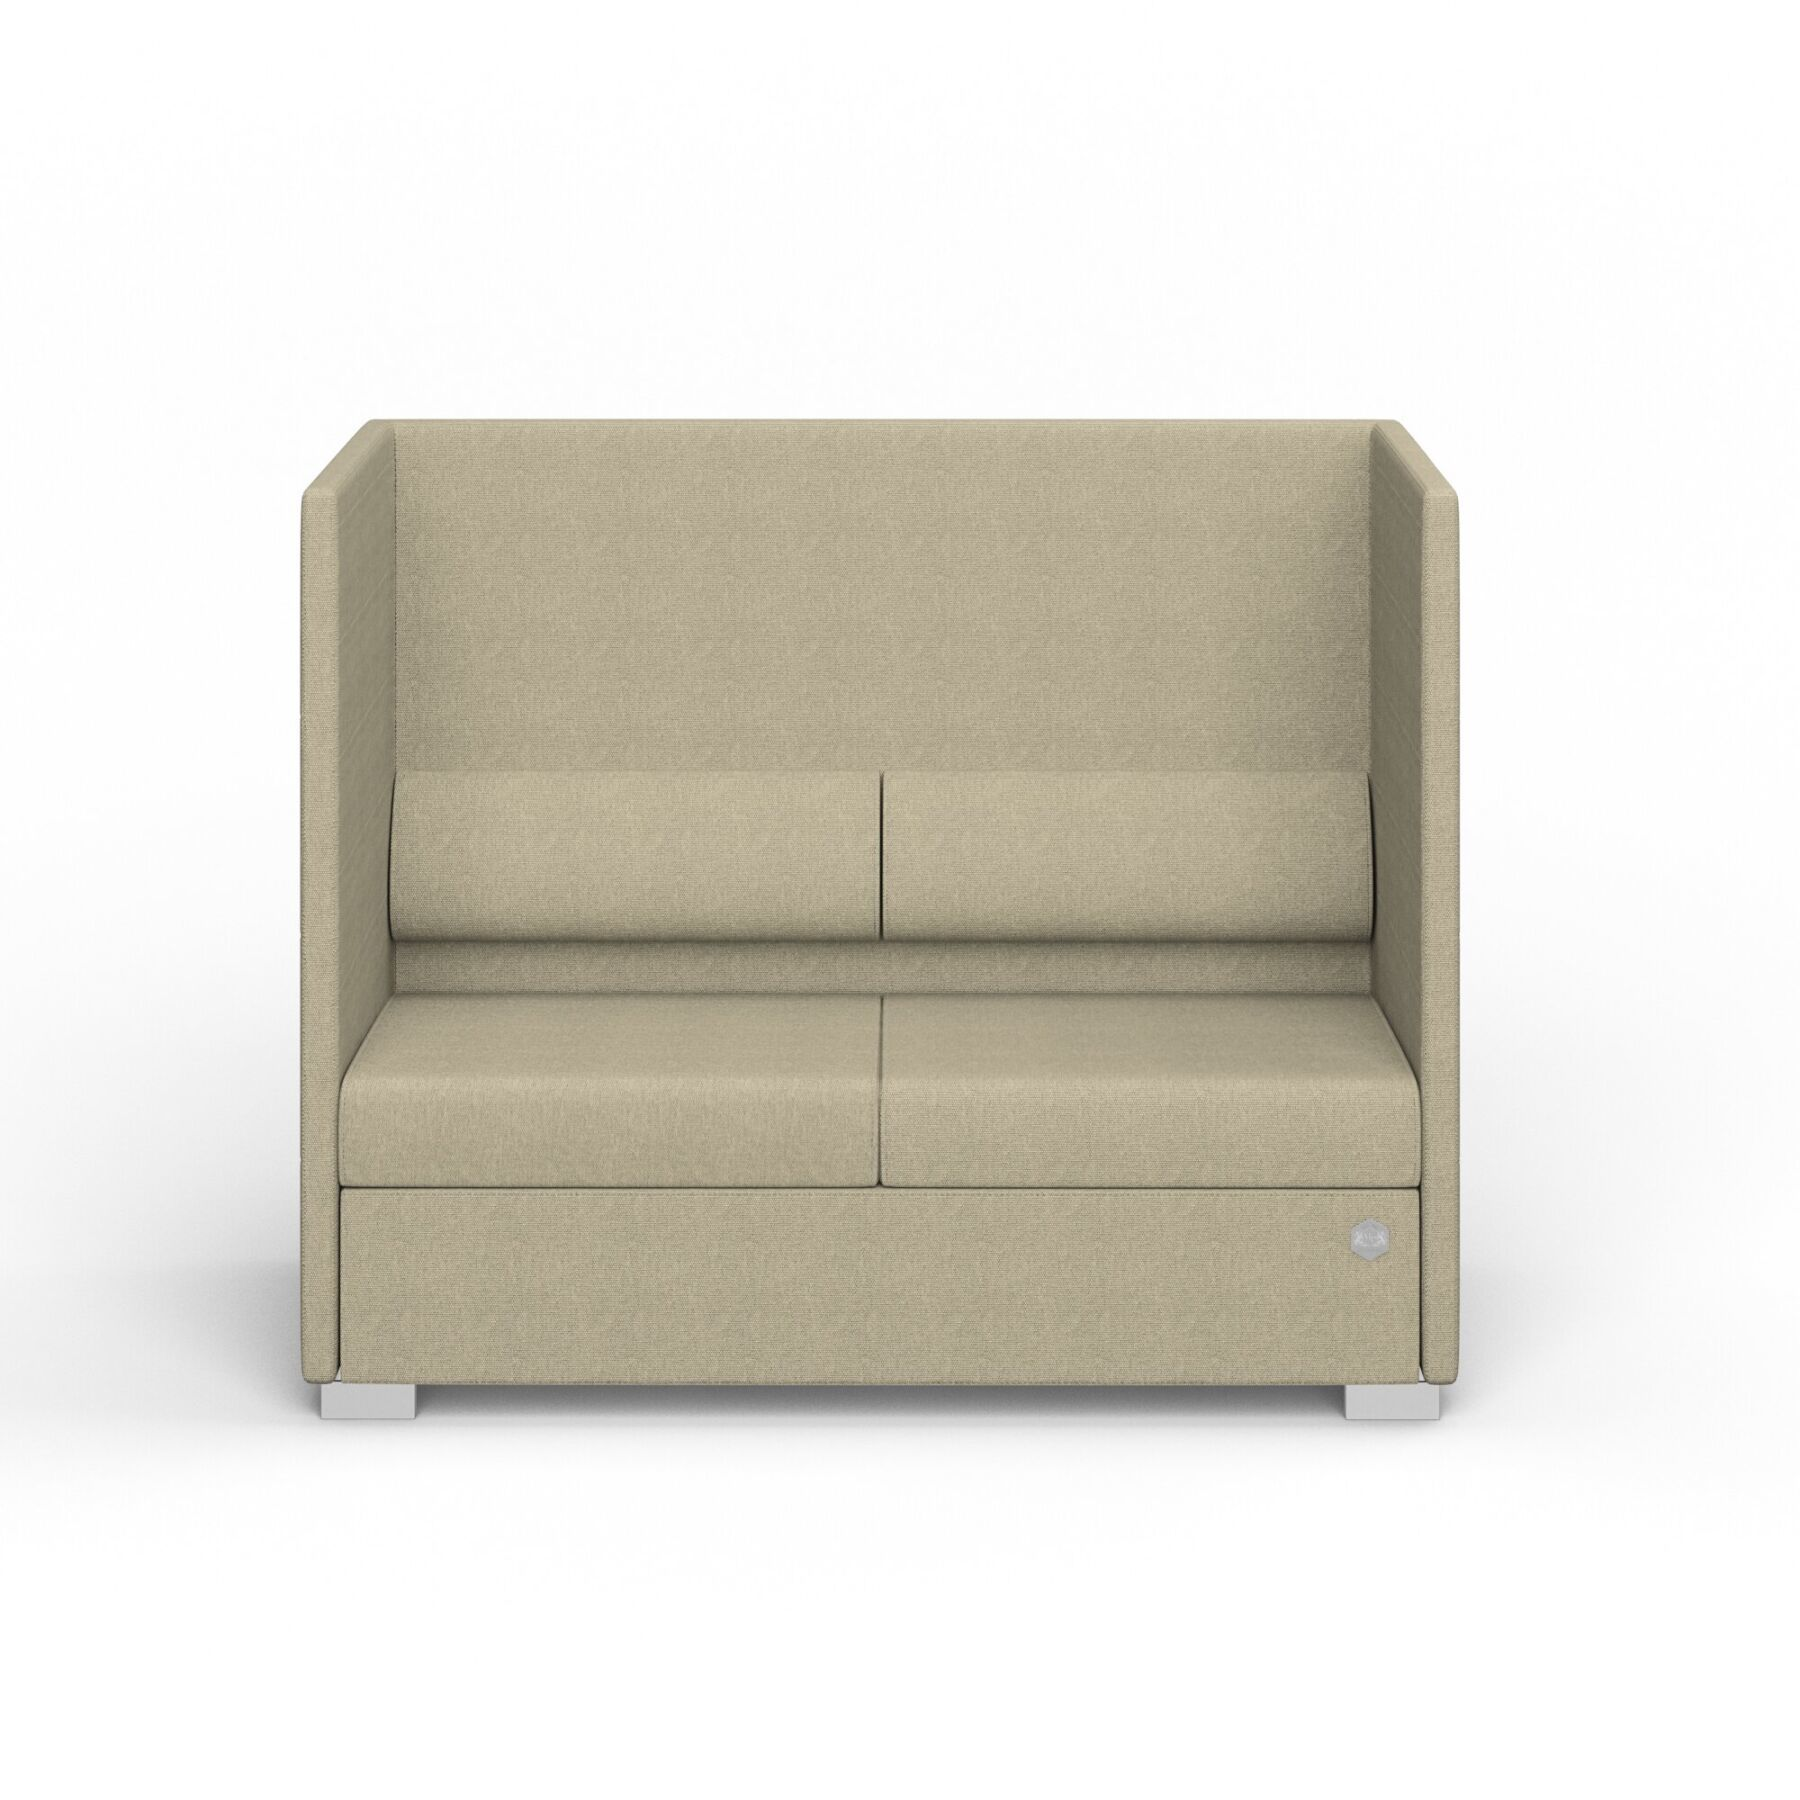 Двухместный диван KULIK SYSTEM PRIVATE Ткань 2